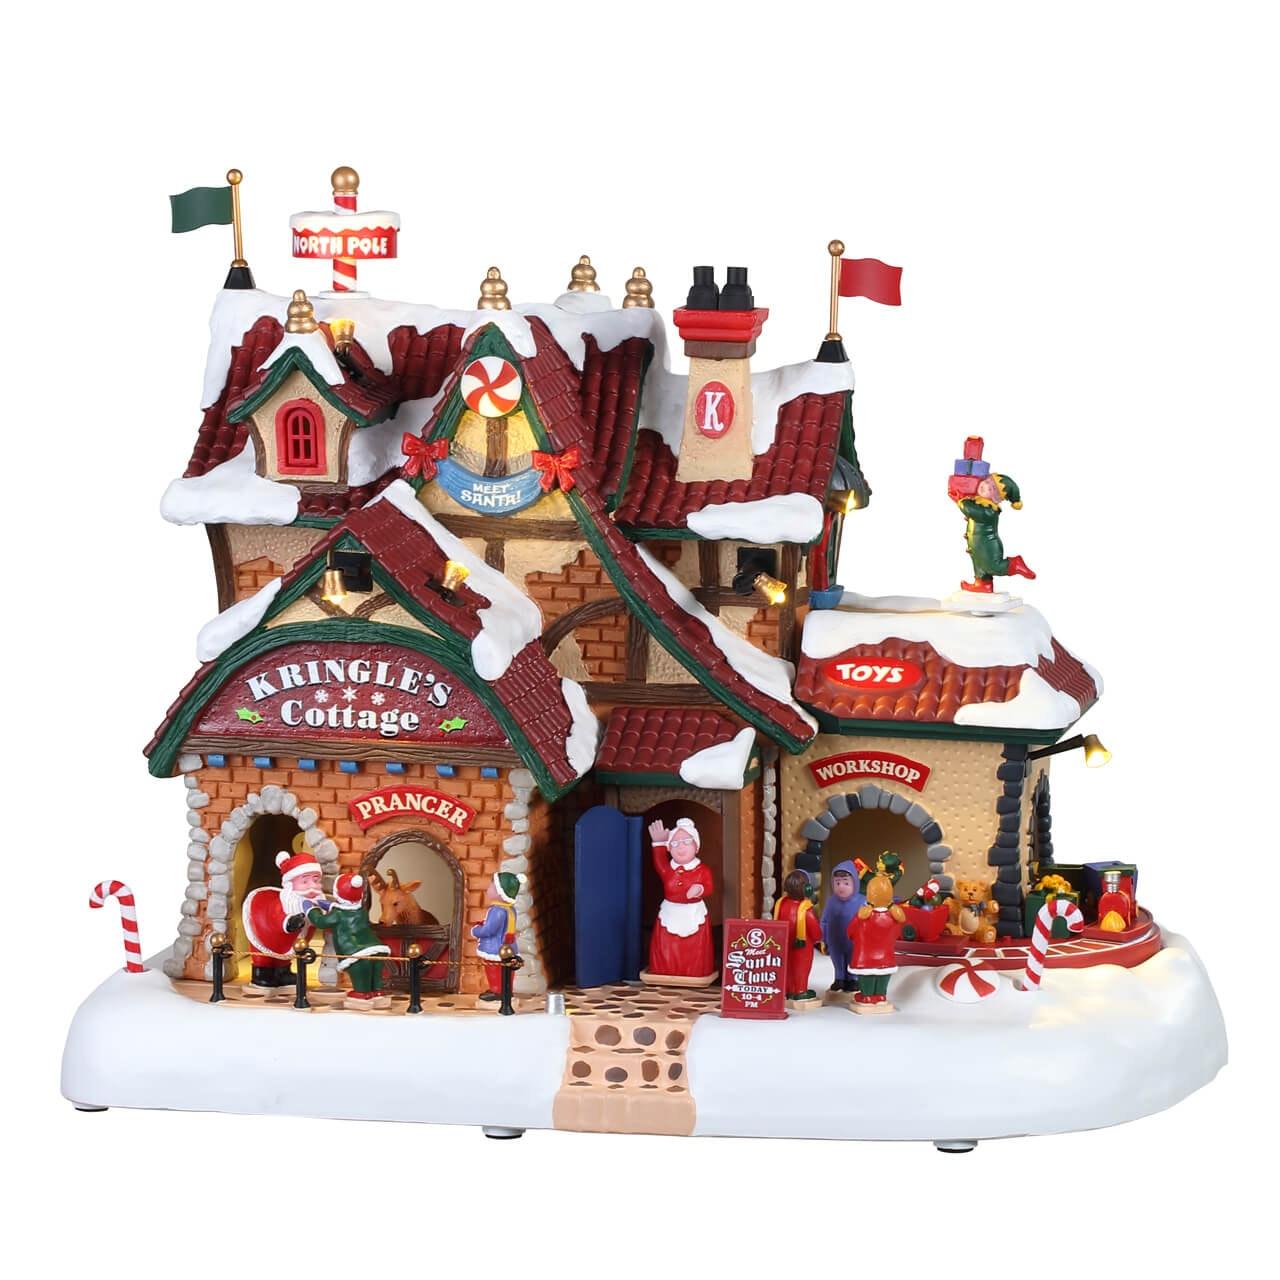 Kringles For Christmas.Kringle S Cottage